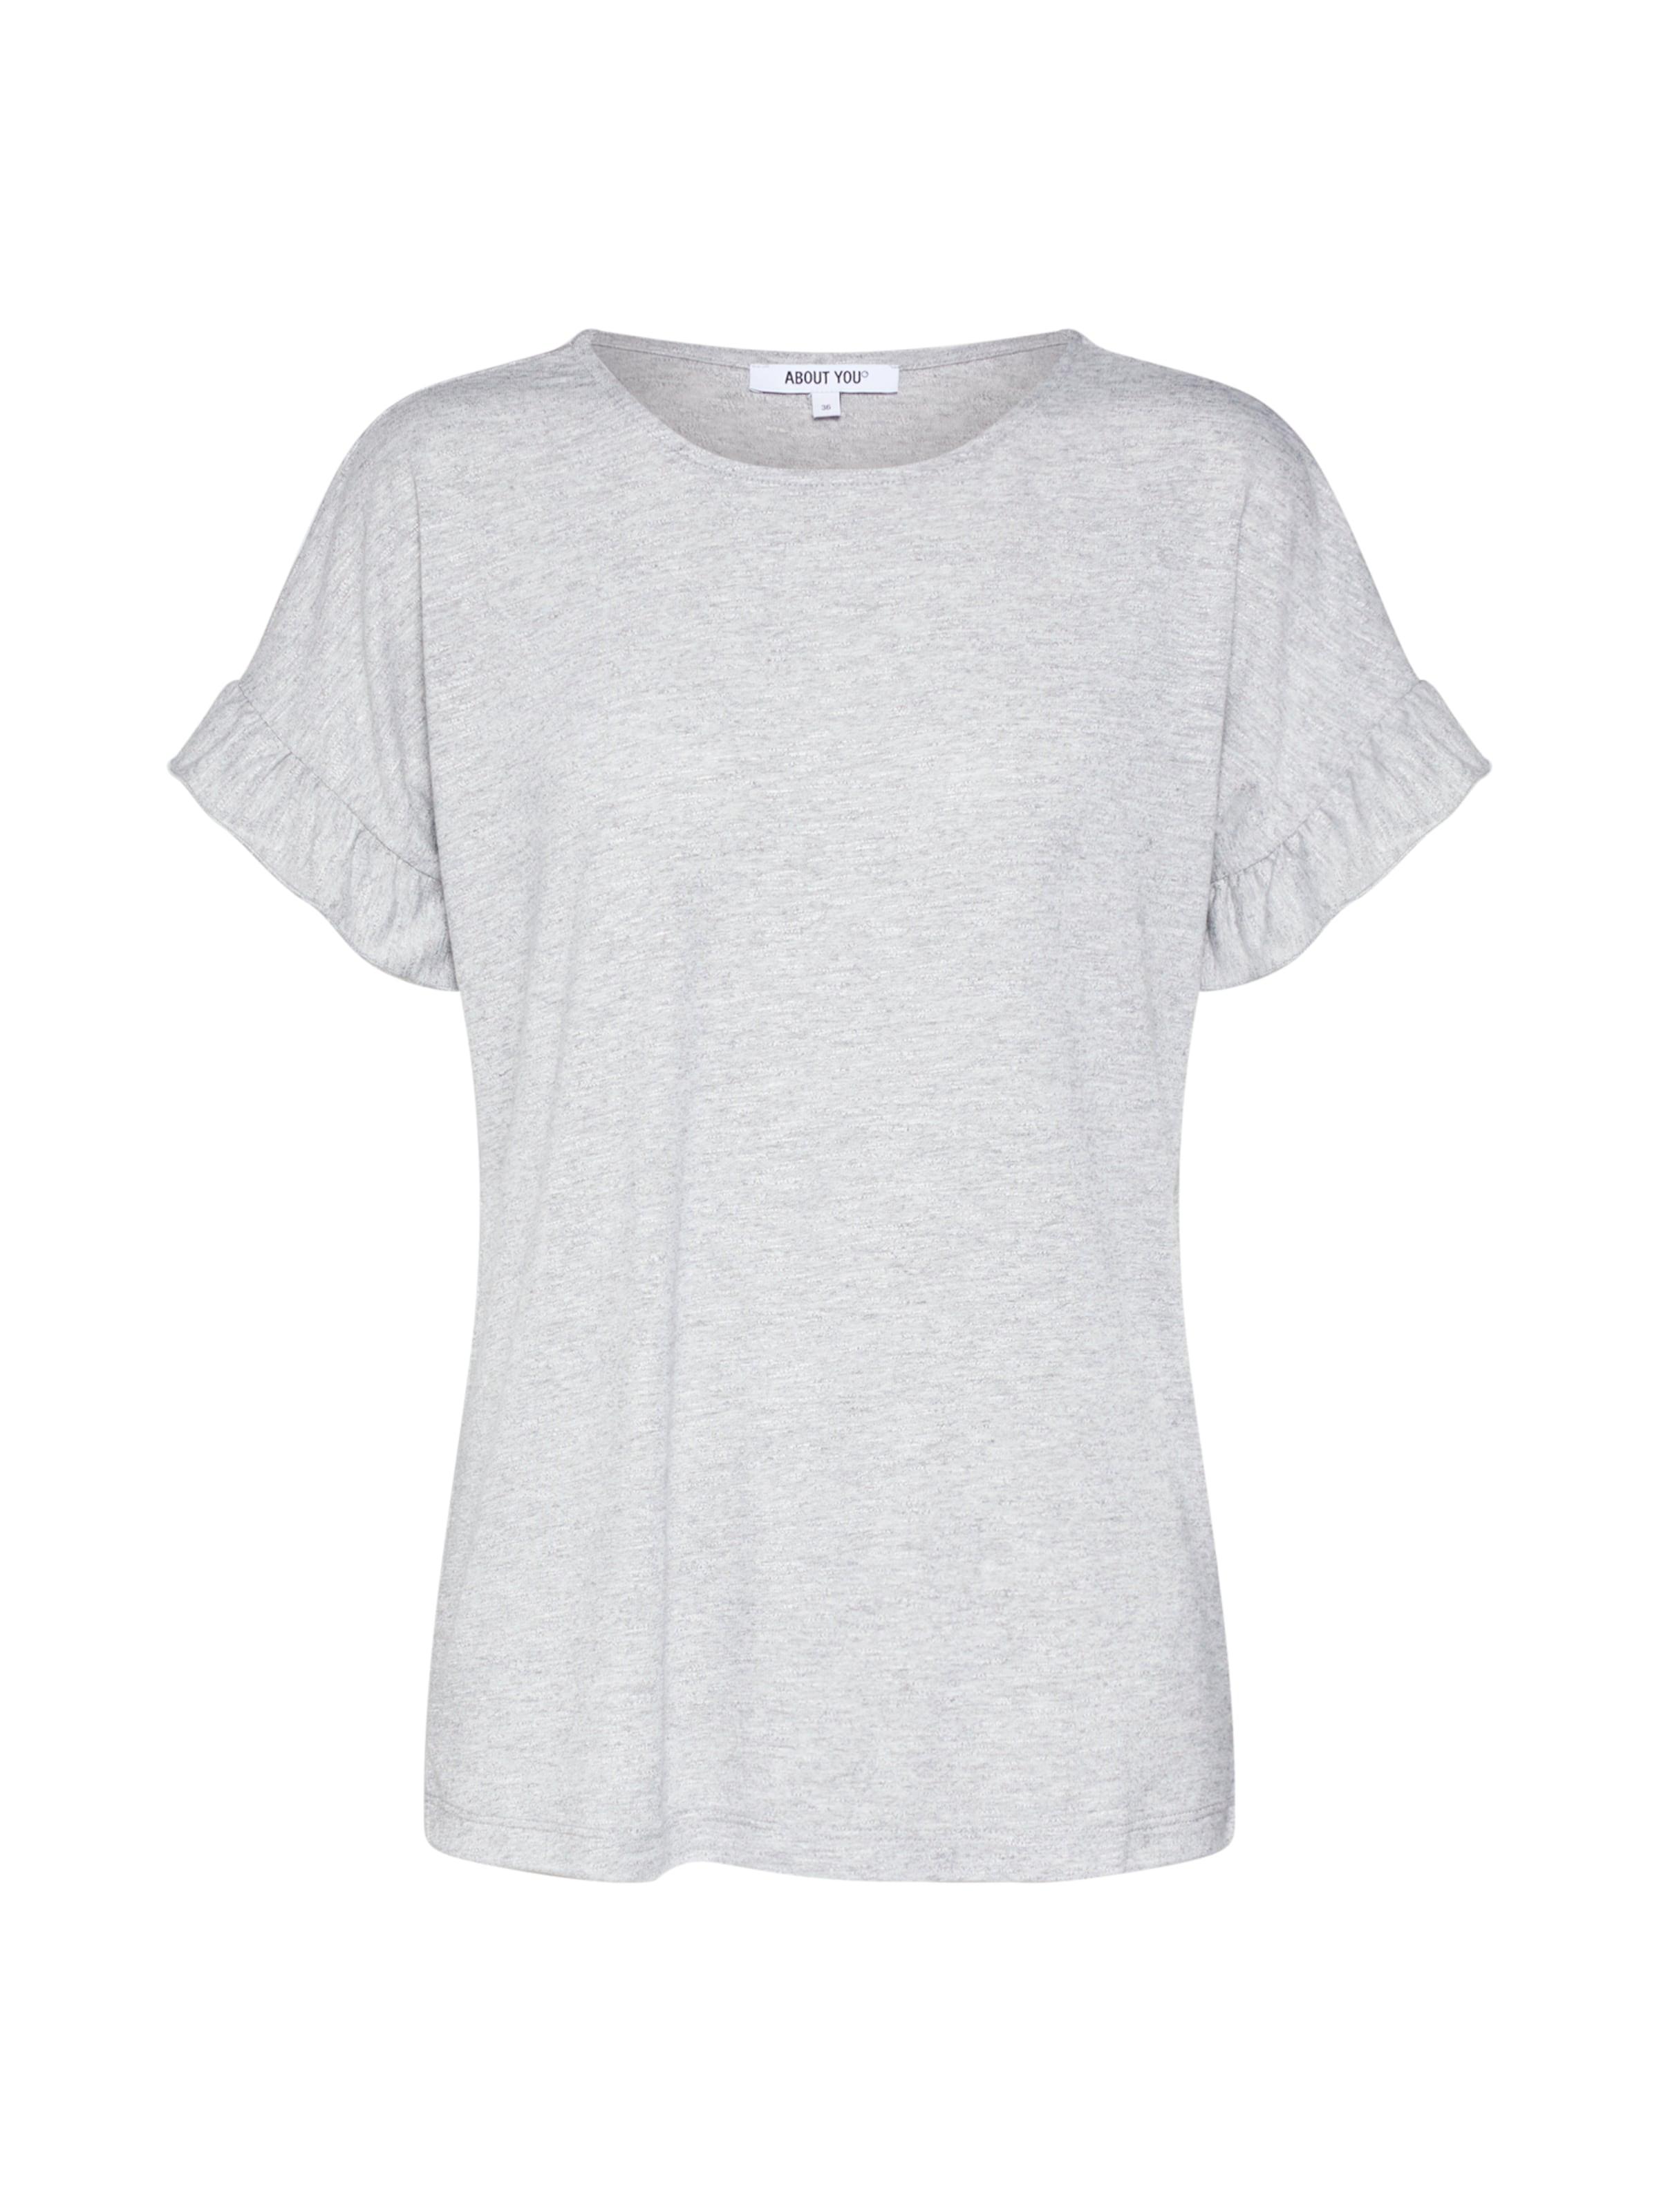 shirt About 'lia' T Gris You En LqVGMpzSU